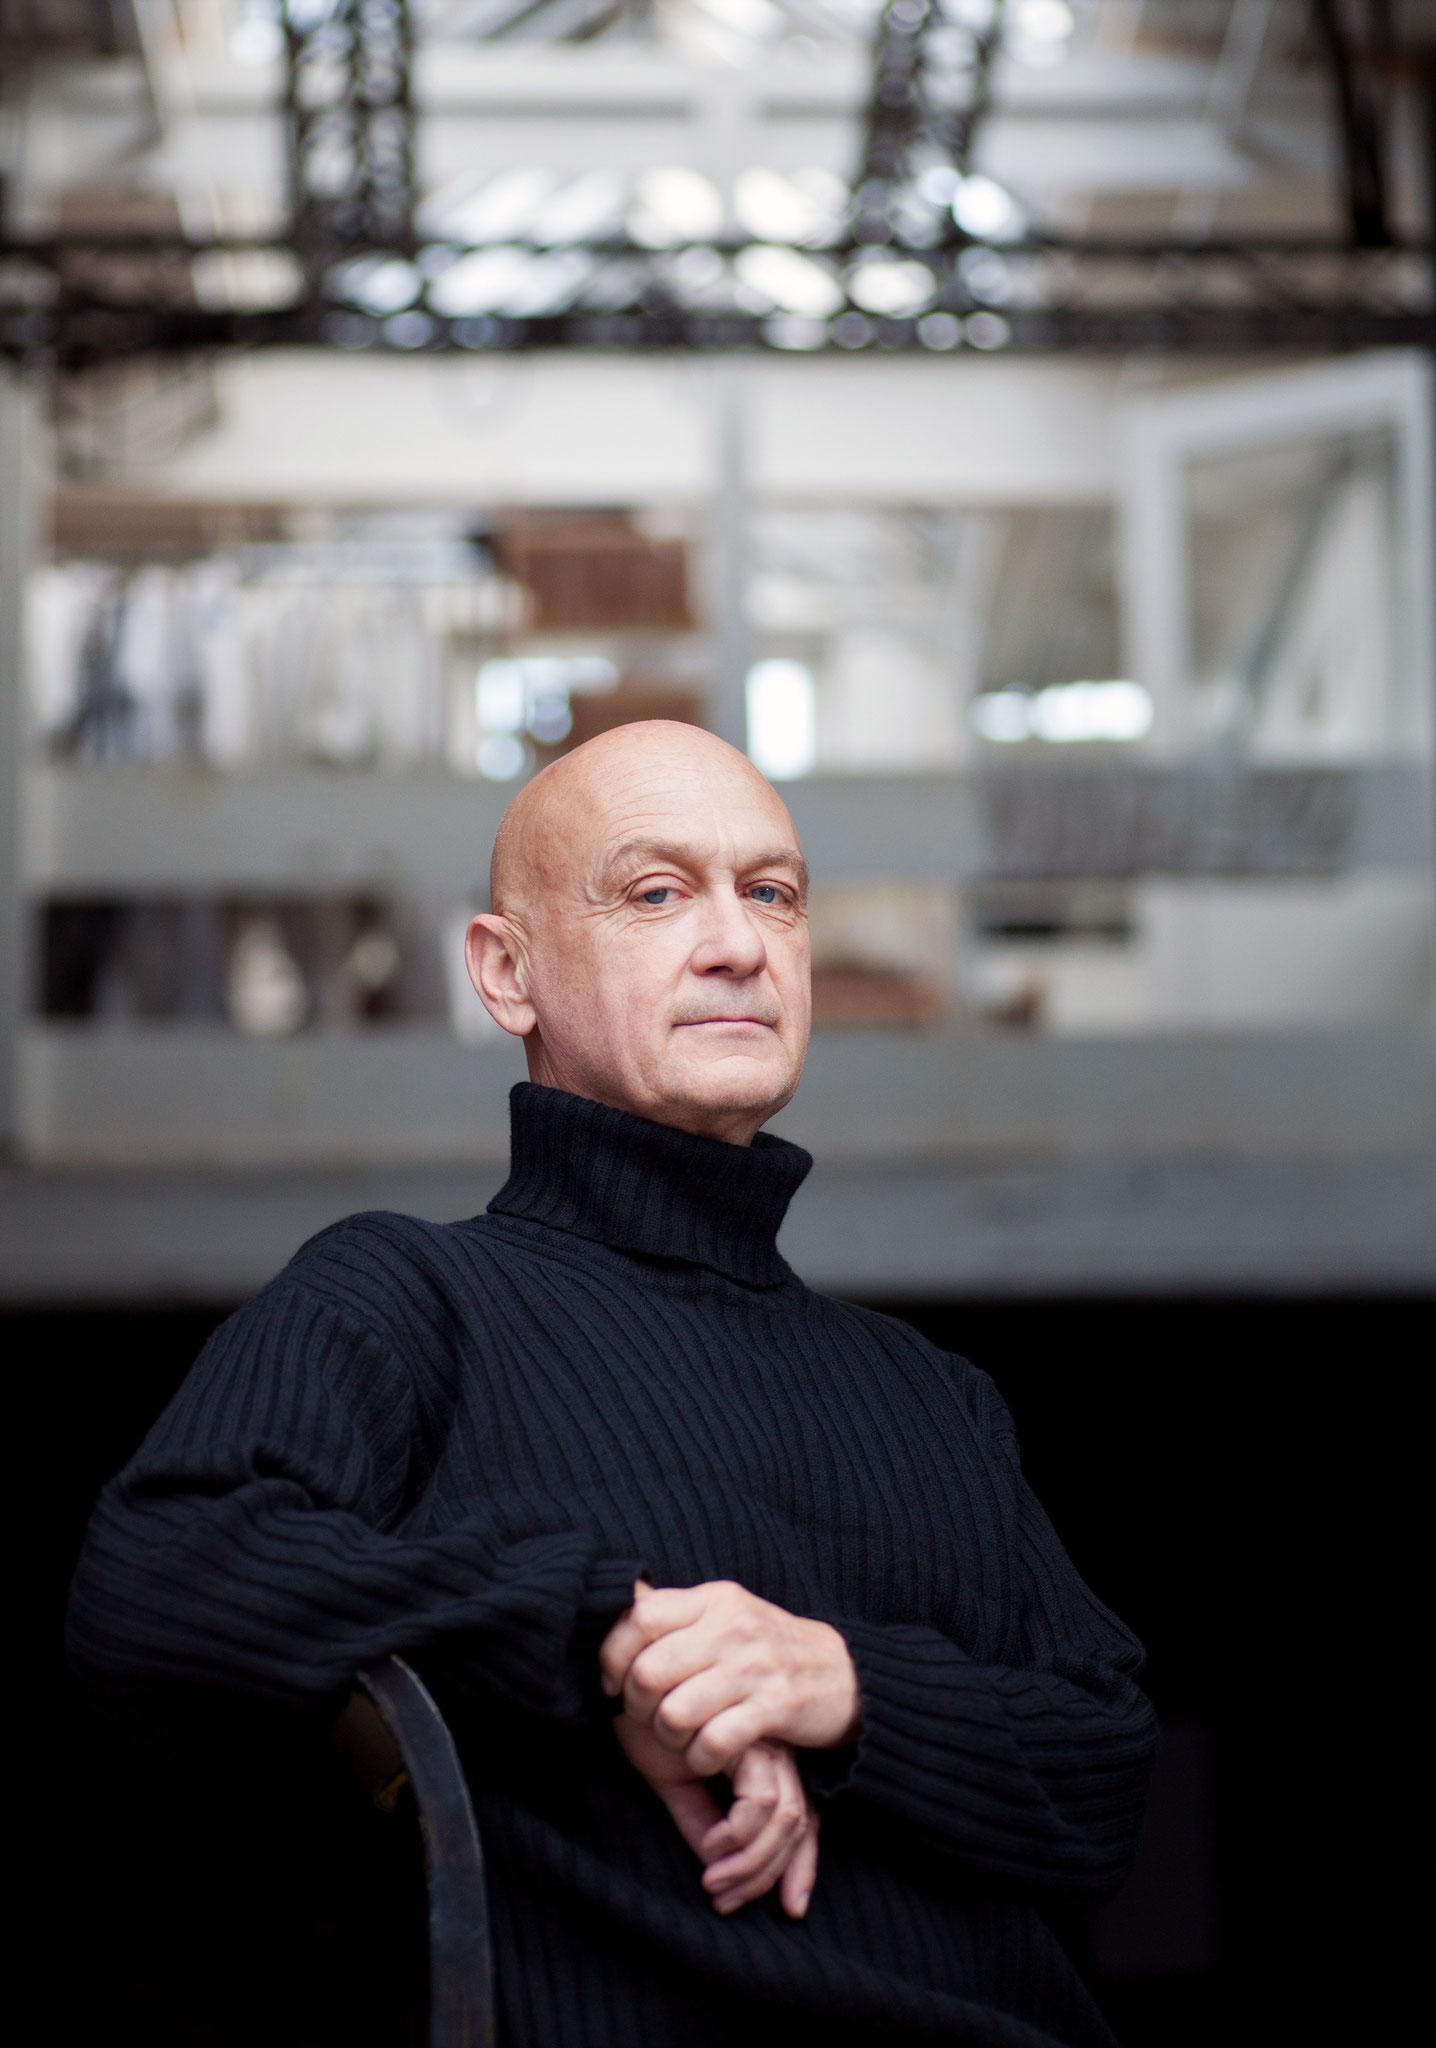 MICHAEL ELBER |ZÜRICH